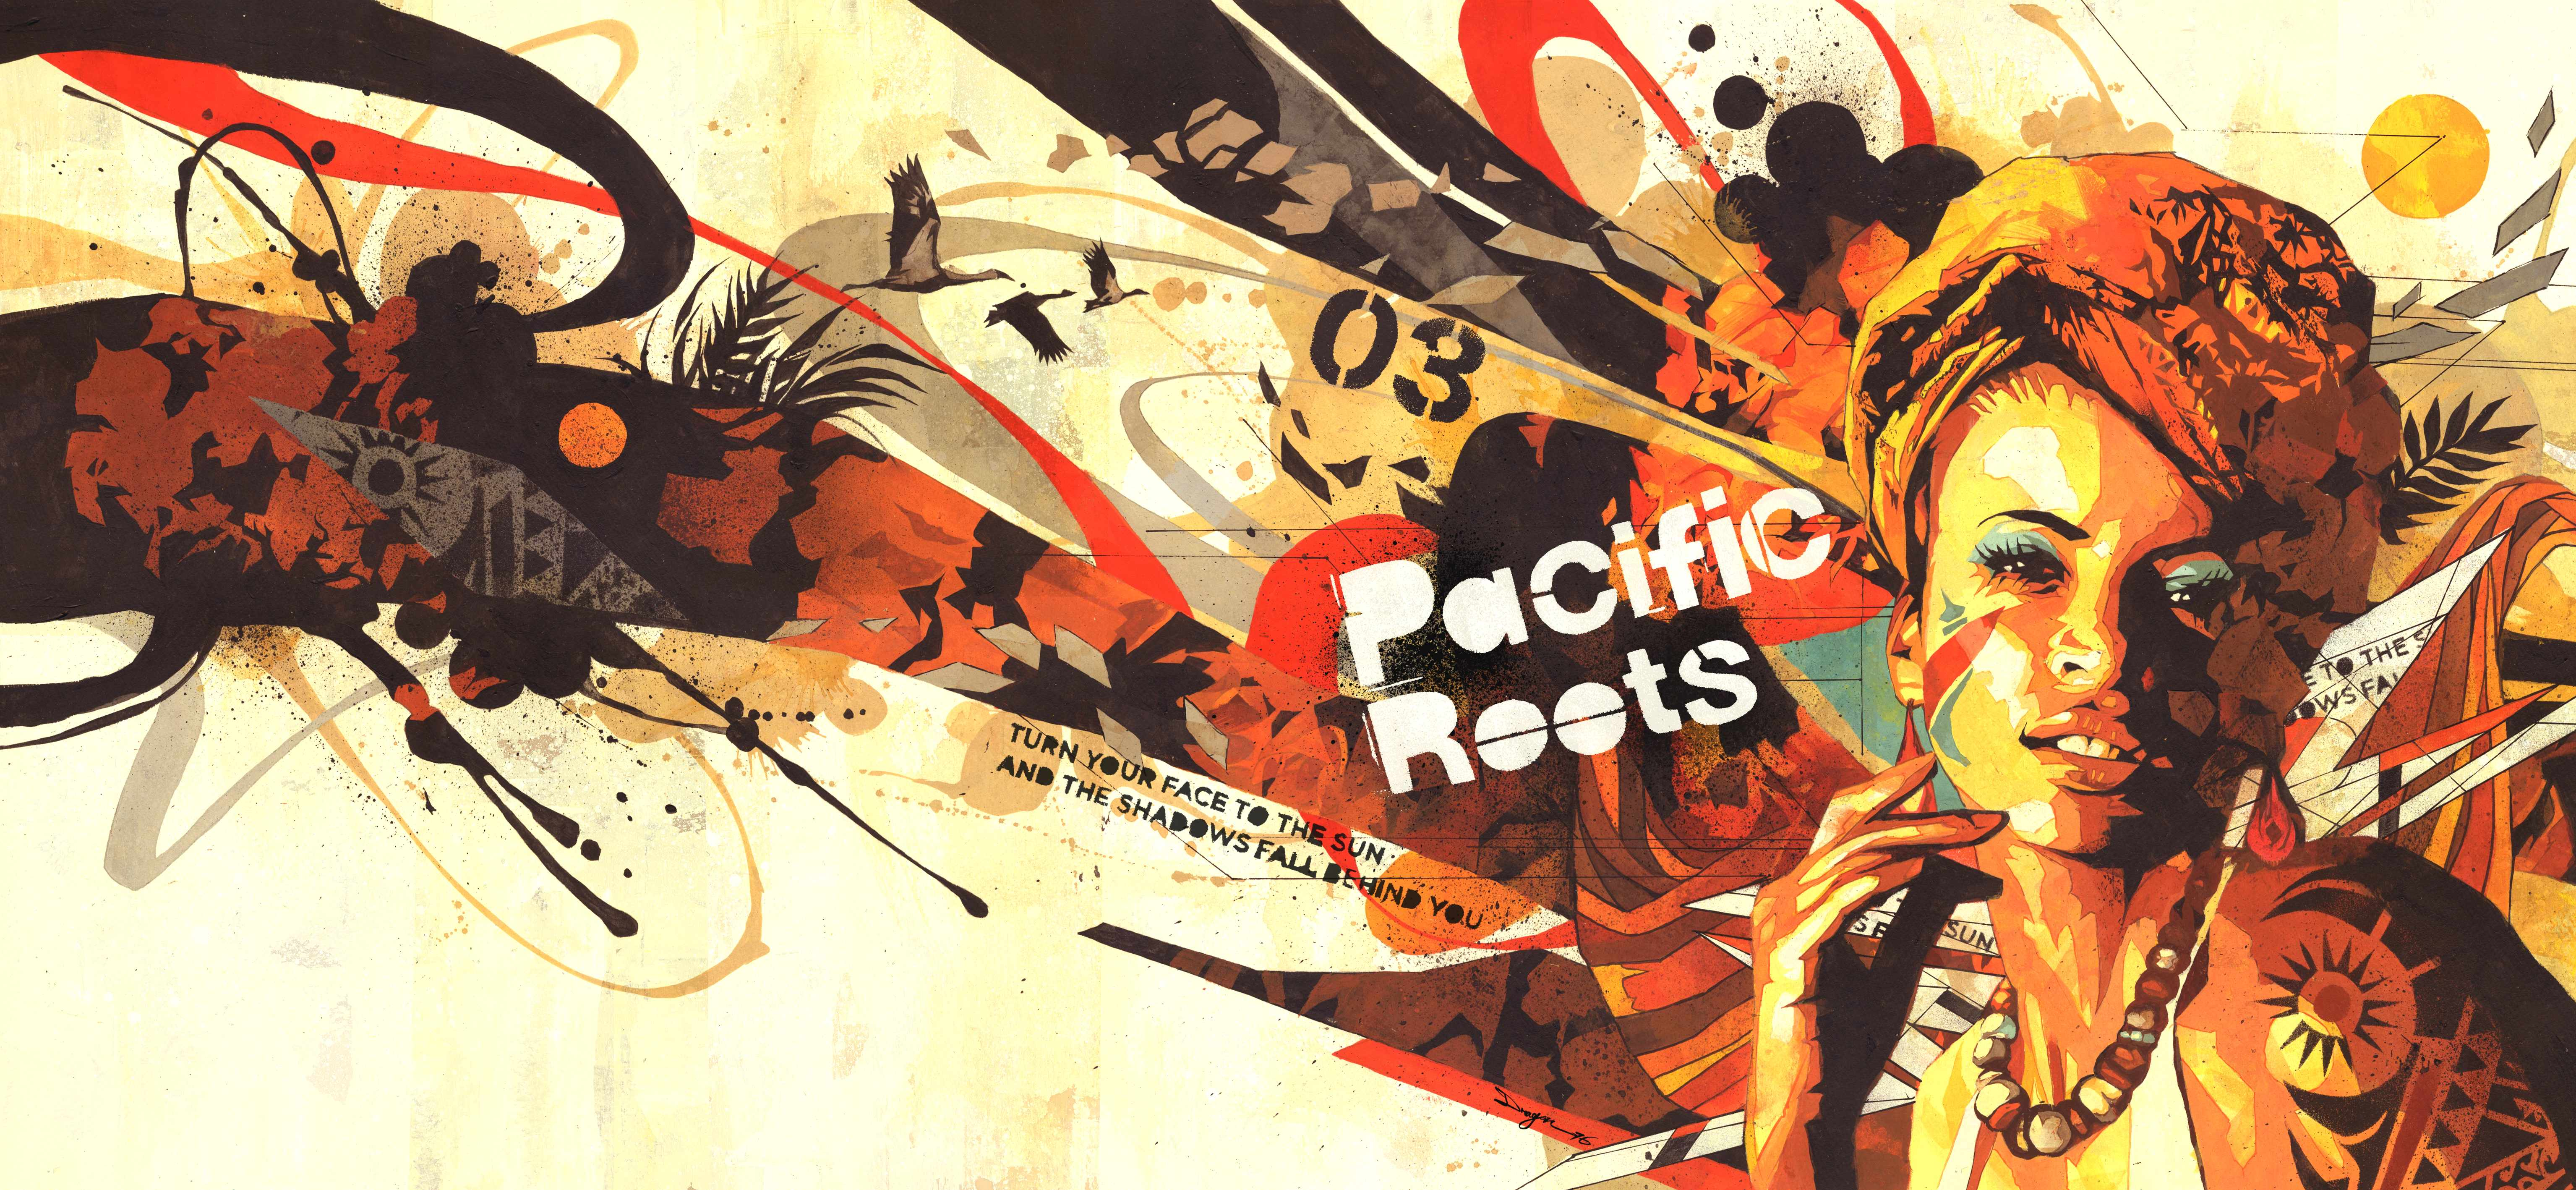 JP_PacificRoots3_mini